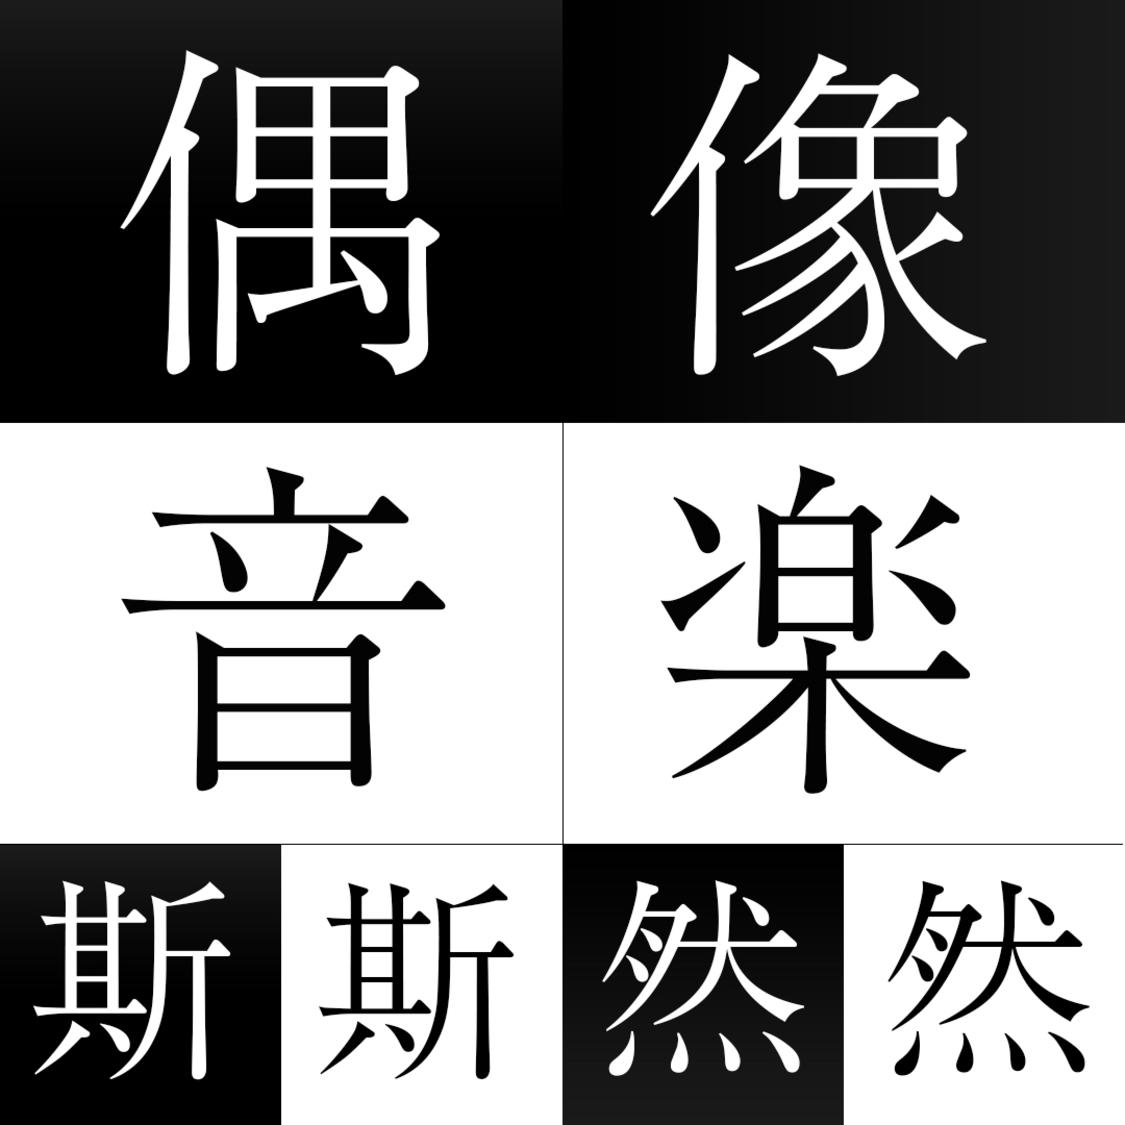 PINK CRES.を今改めて振り返る 新感覚ガーリー&ハッピーオーラ全開の圧倒的なガールクラッシュ 「偶像音楽 斯斯然然」第53回